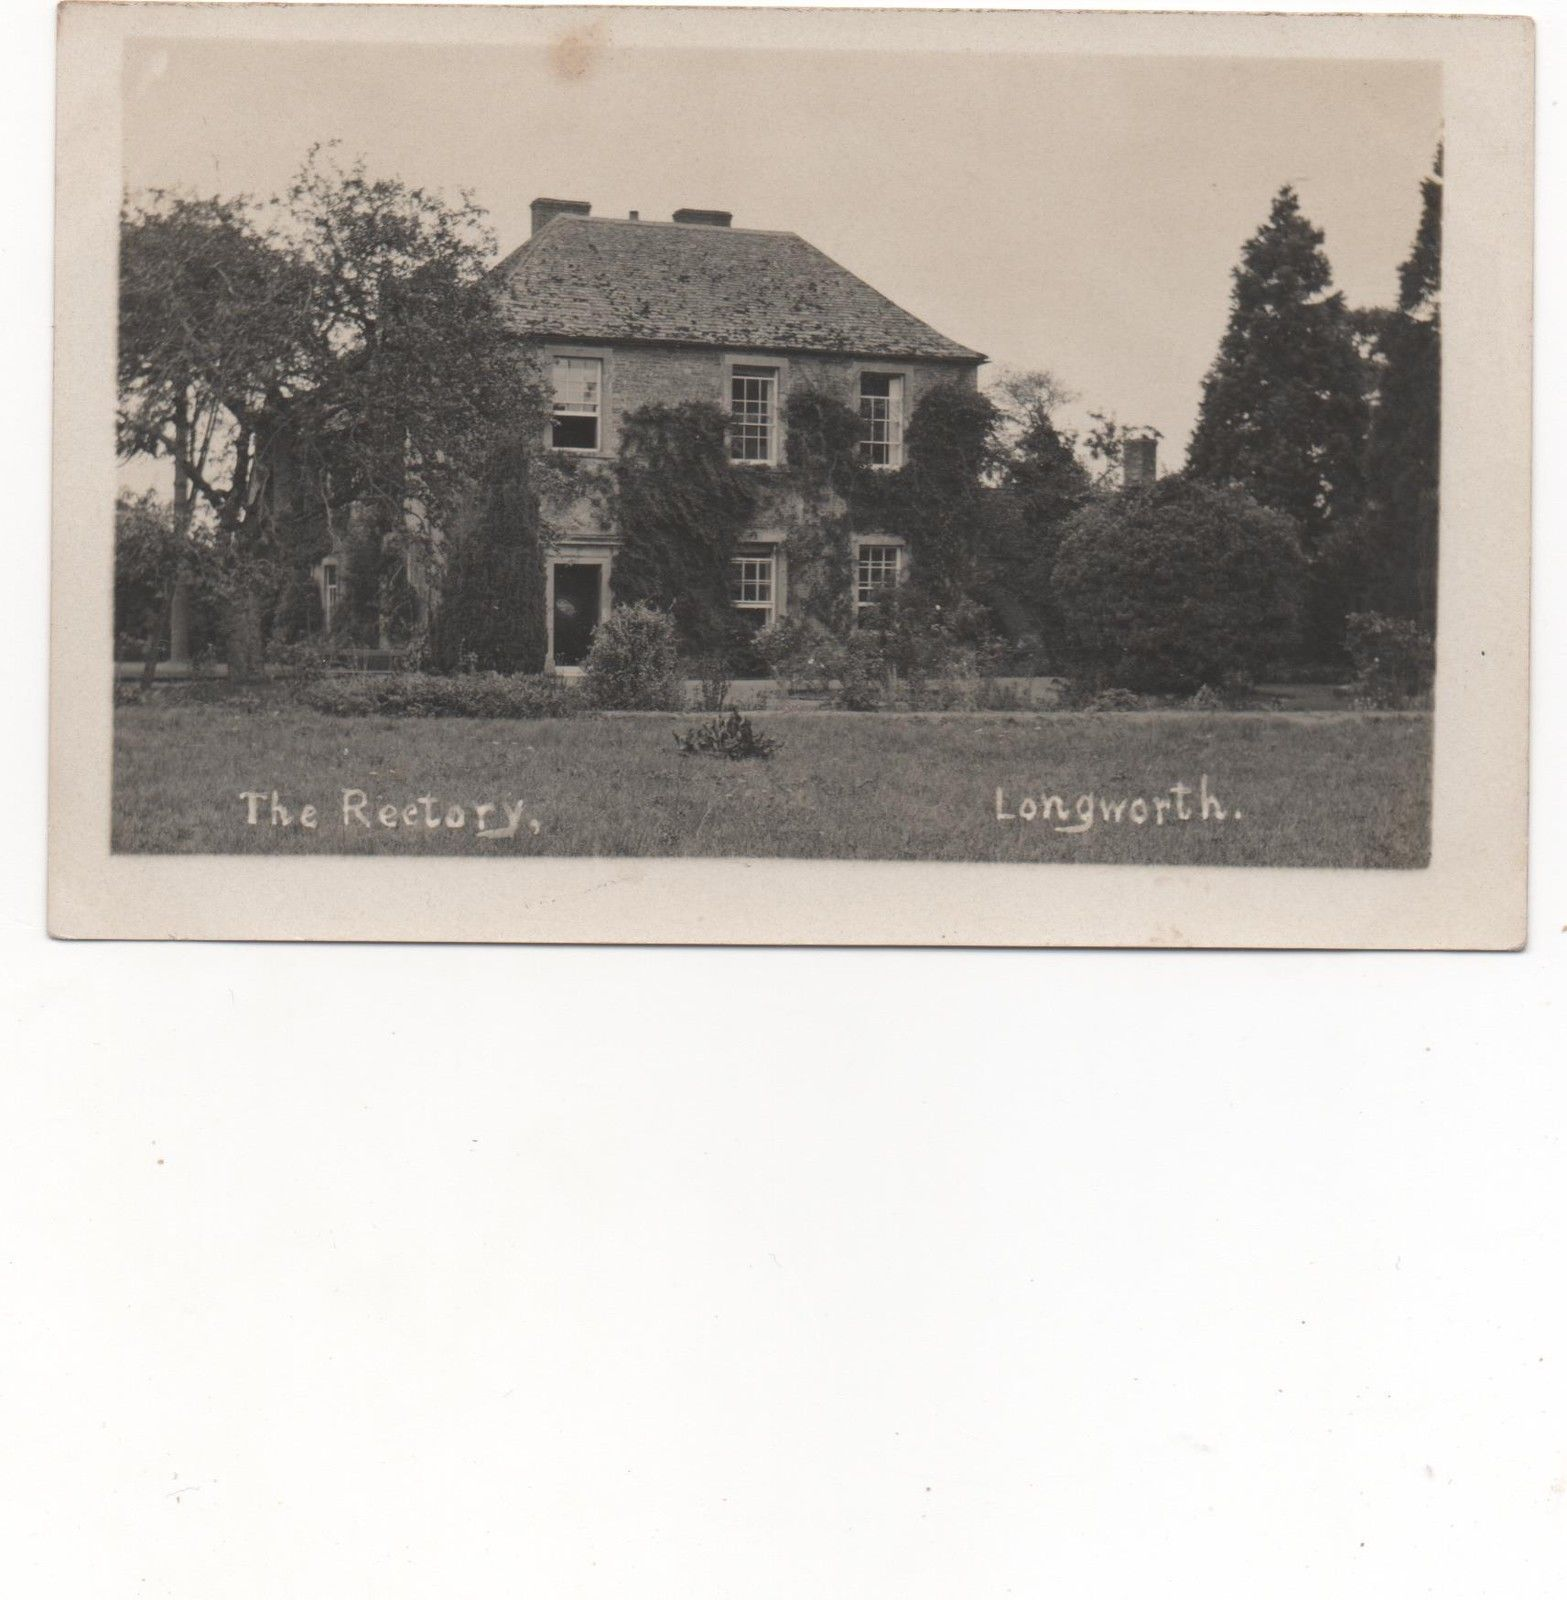 The Rectory, Longworth,Oxfordshire,RPPC | eBay